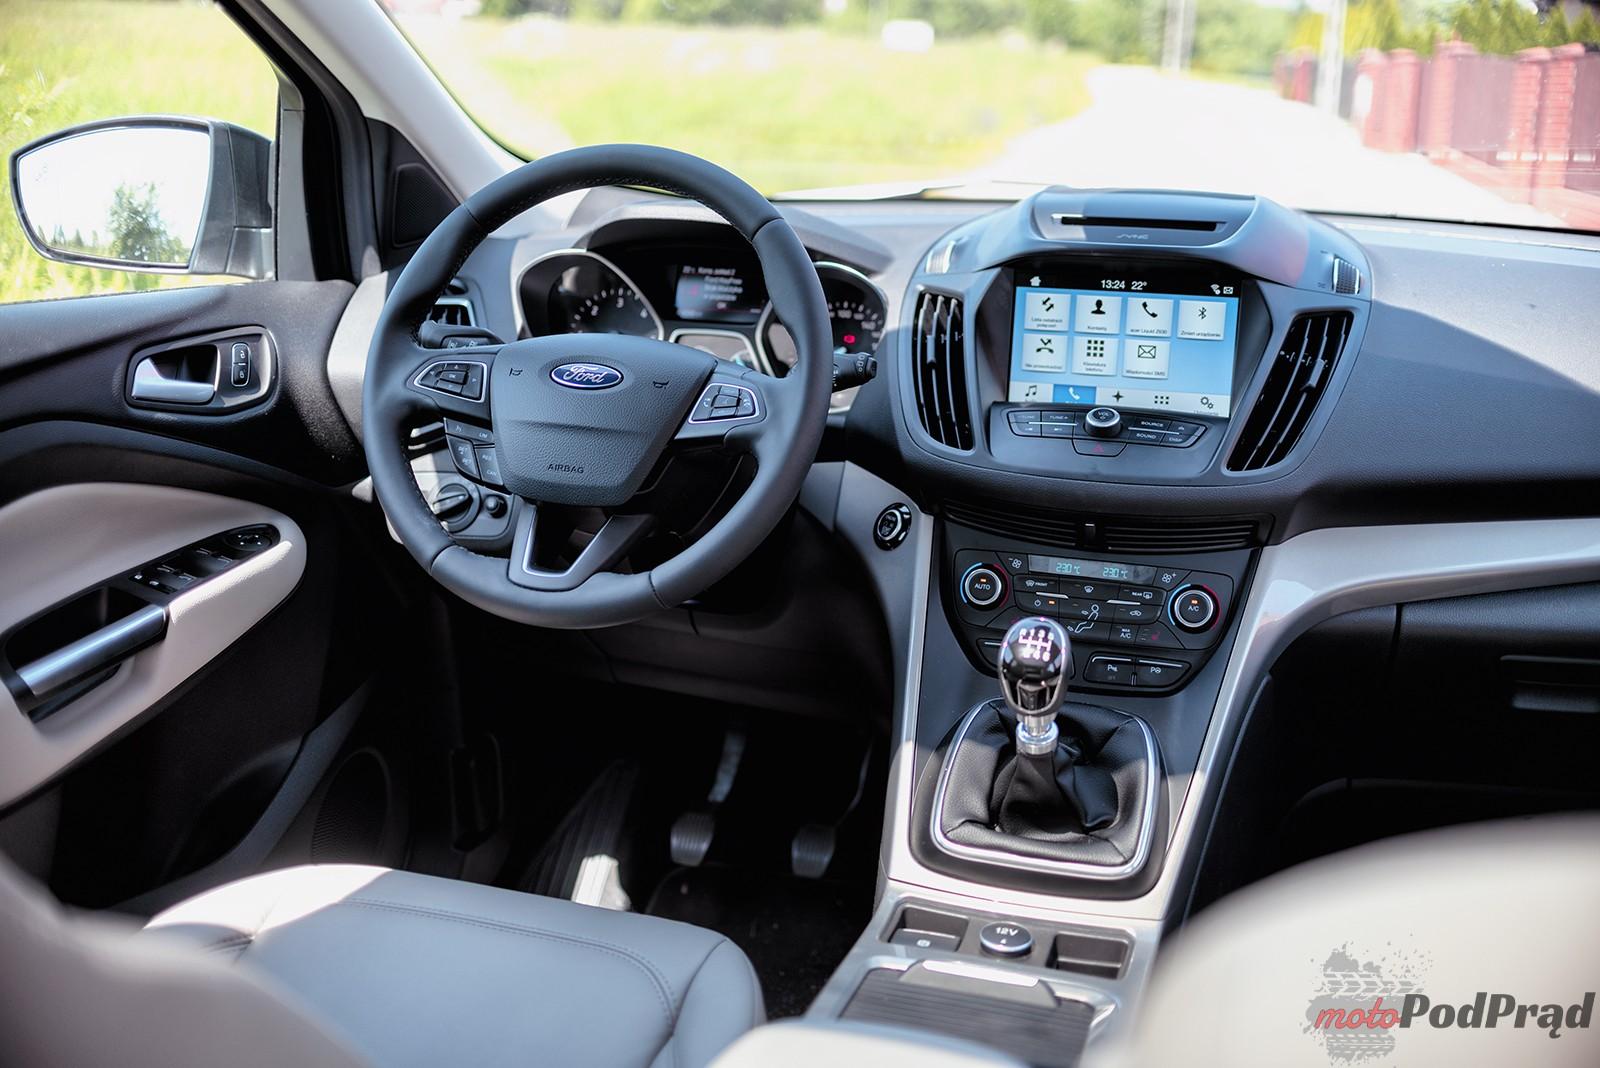 Ford Kuga 28 Test: Ford Kuga 2.0 TDCi 150 KM  dobry powrót